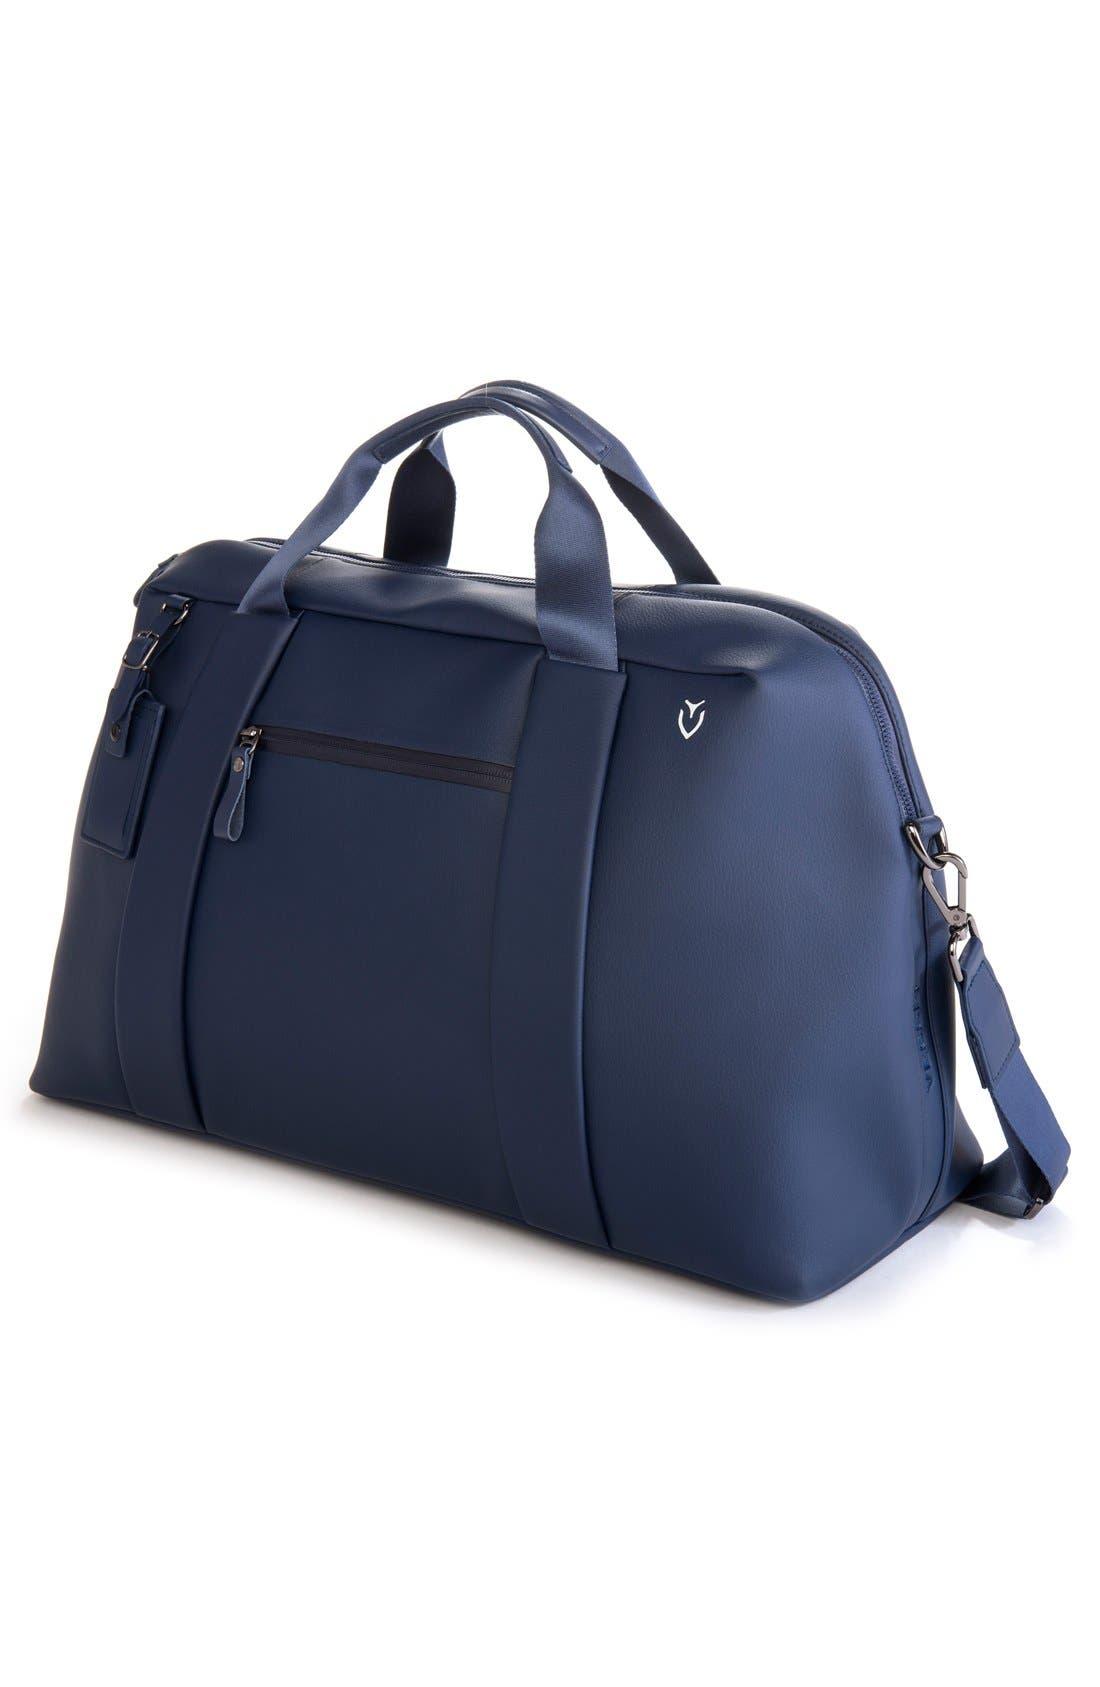 Alternate Image 3  - Vessel 'Signature' Large Duffel Bag